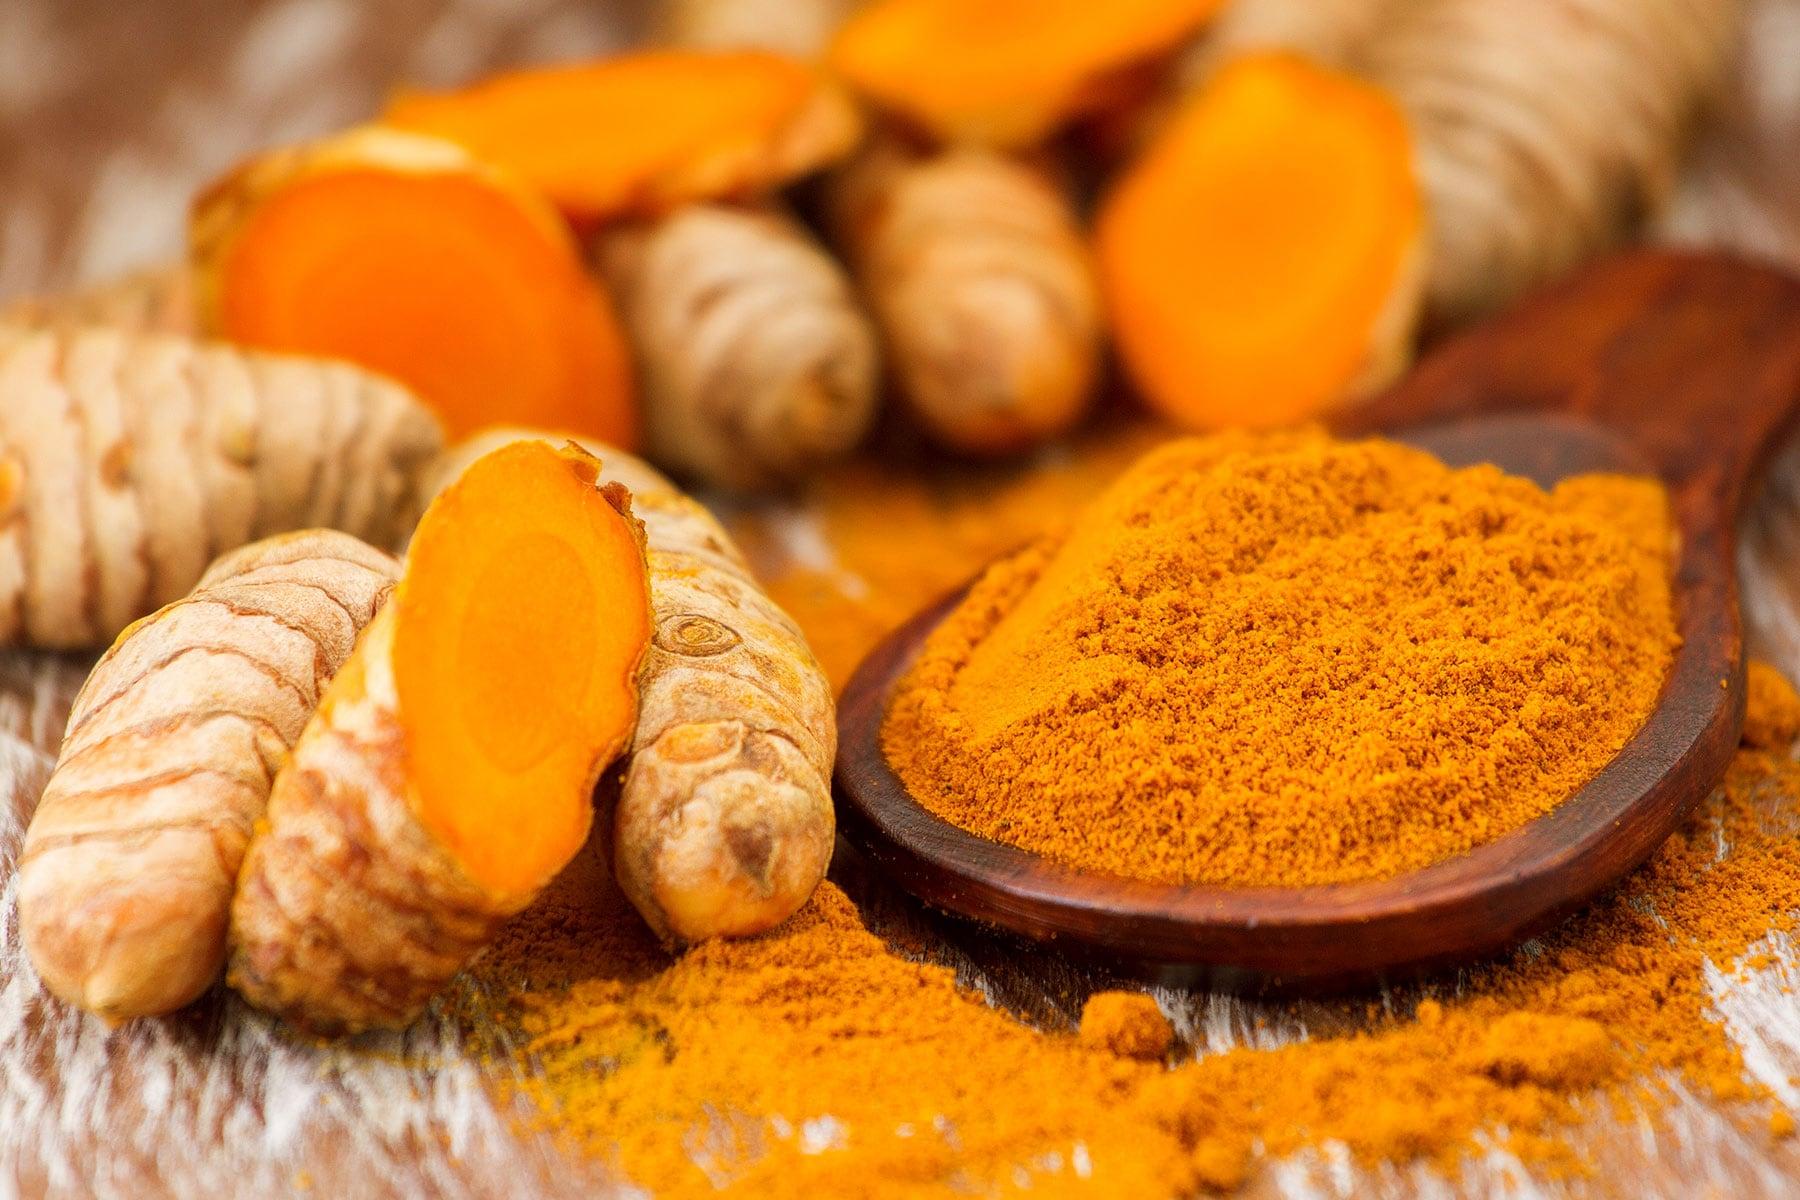 Memanfaatkan Sediaan Herbal & Minyak Esensial Untuk Kesehatan Ternak